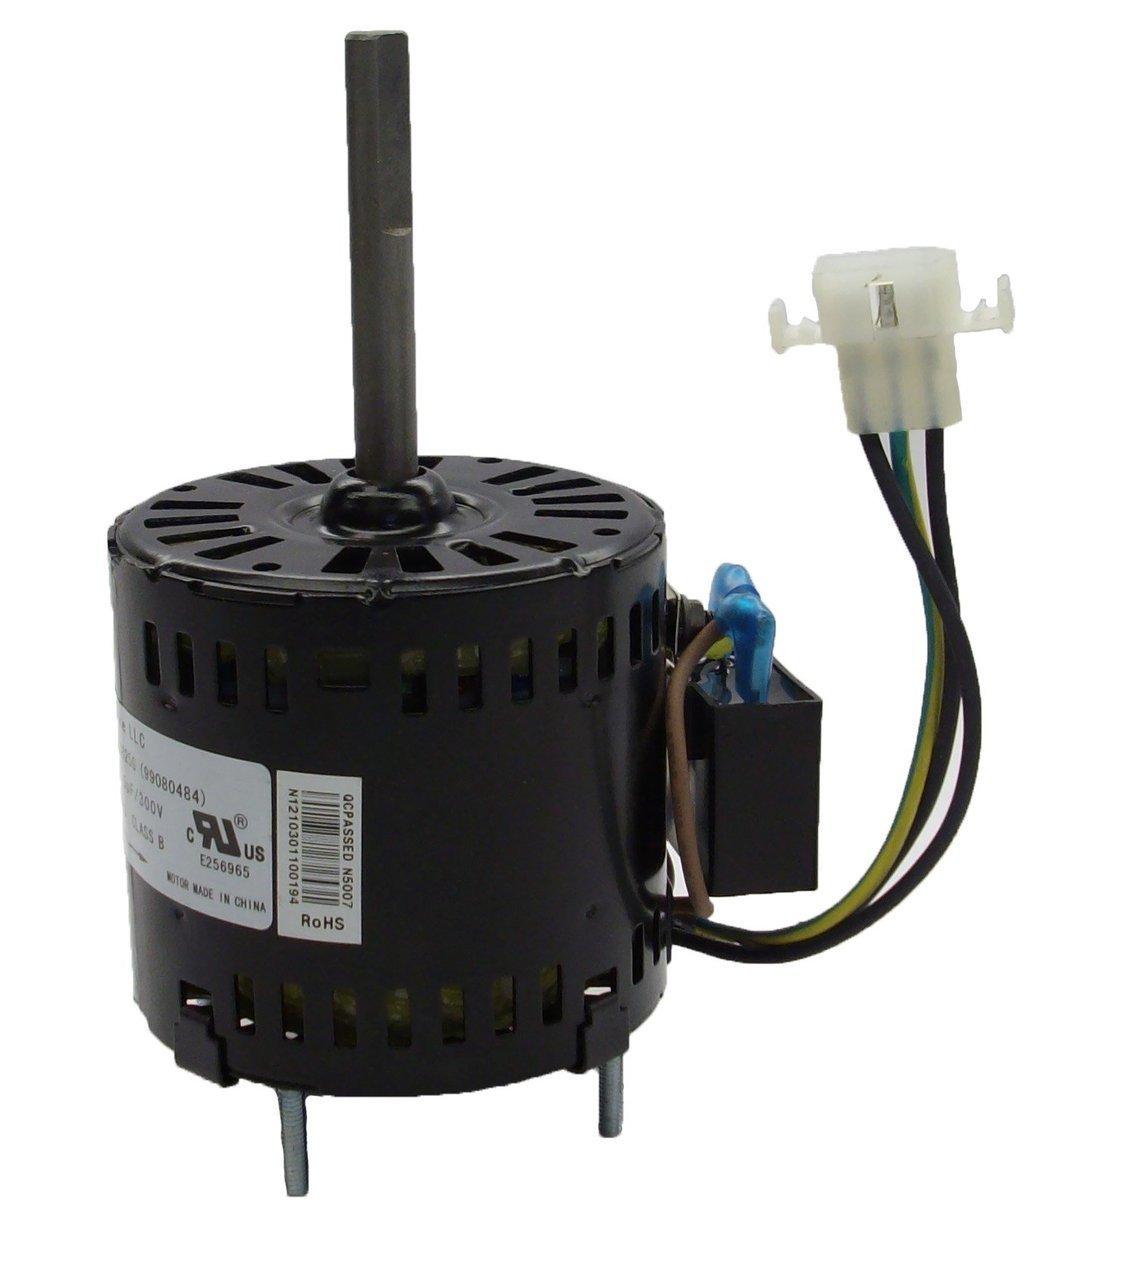 Nutone 99080484 BROAN-NUTONE Fan Motor For L250 Ventilator